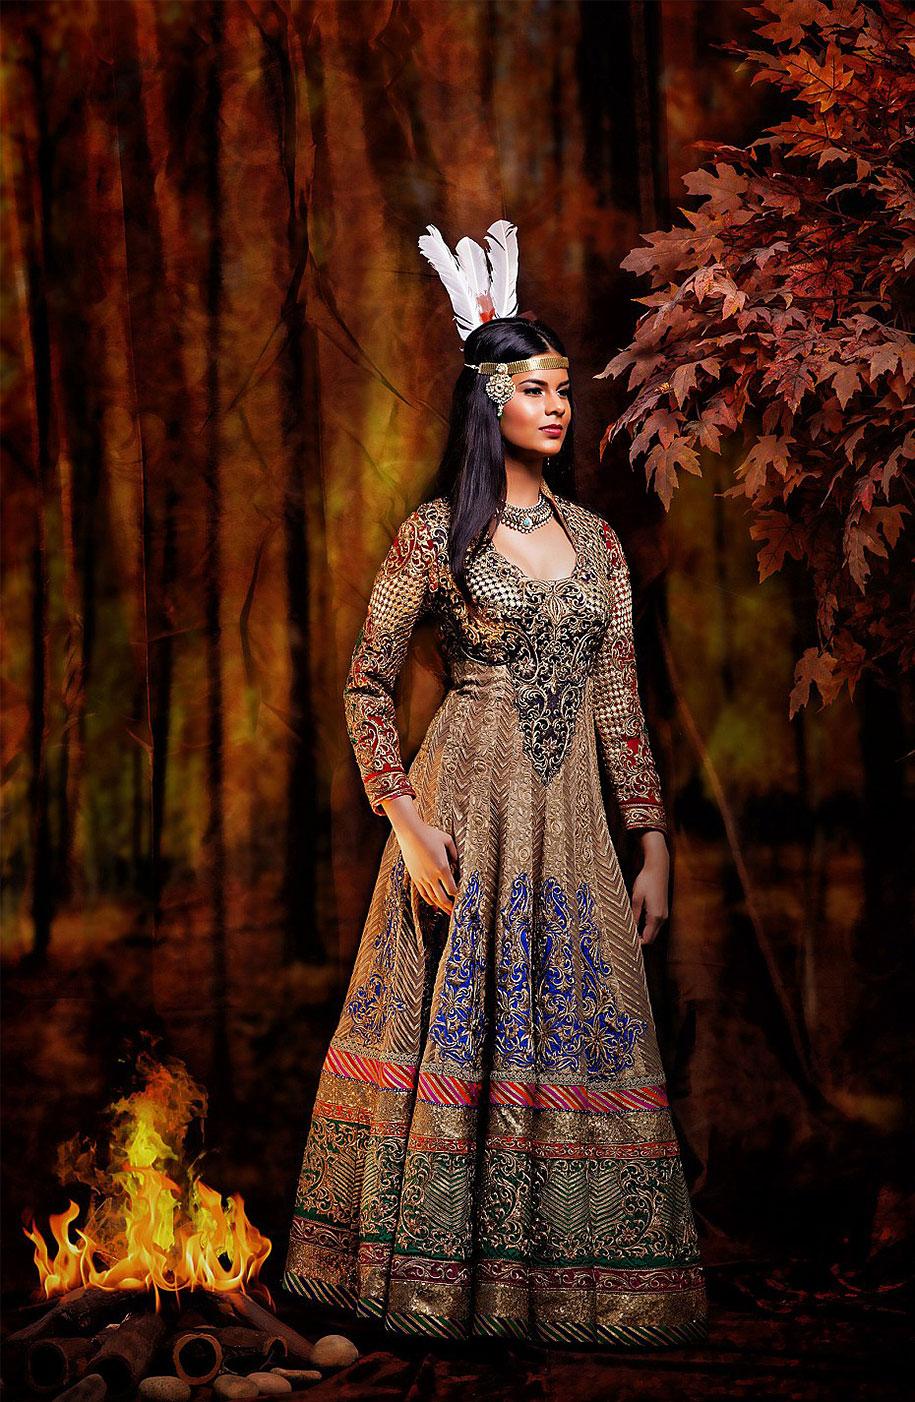 disney-princess-bride-india-wedding-photography-amrit-grewal-4